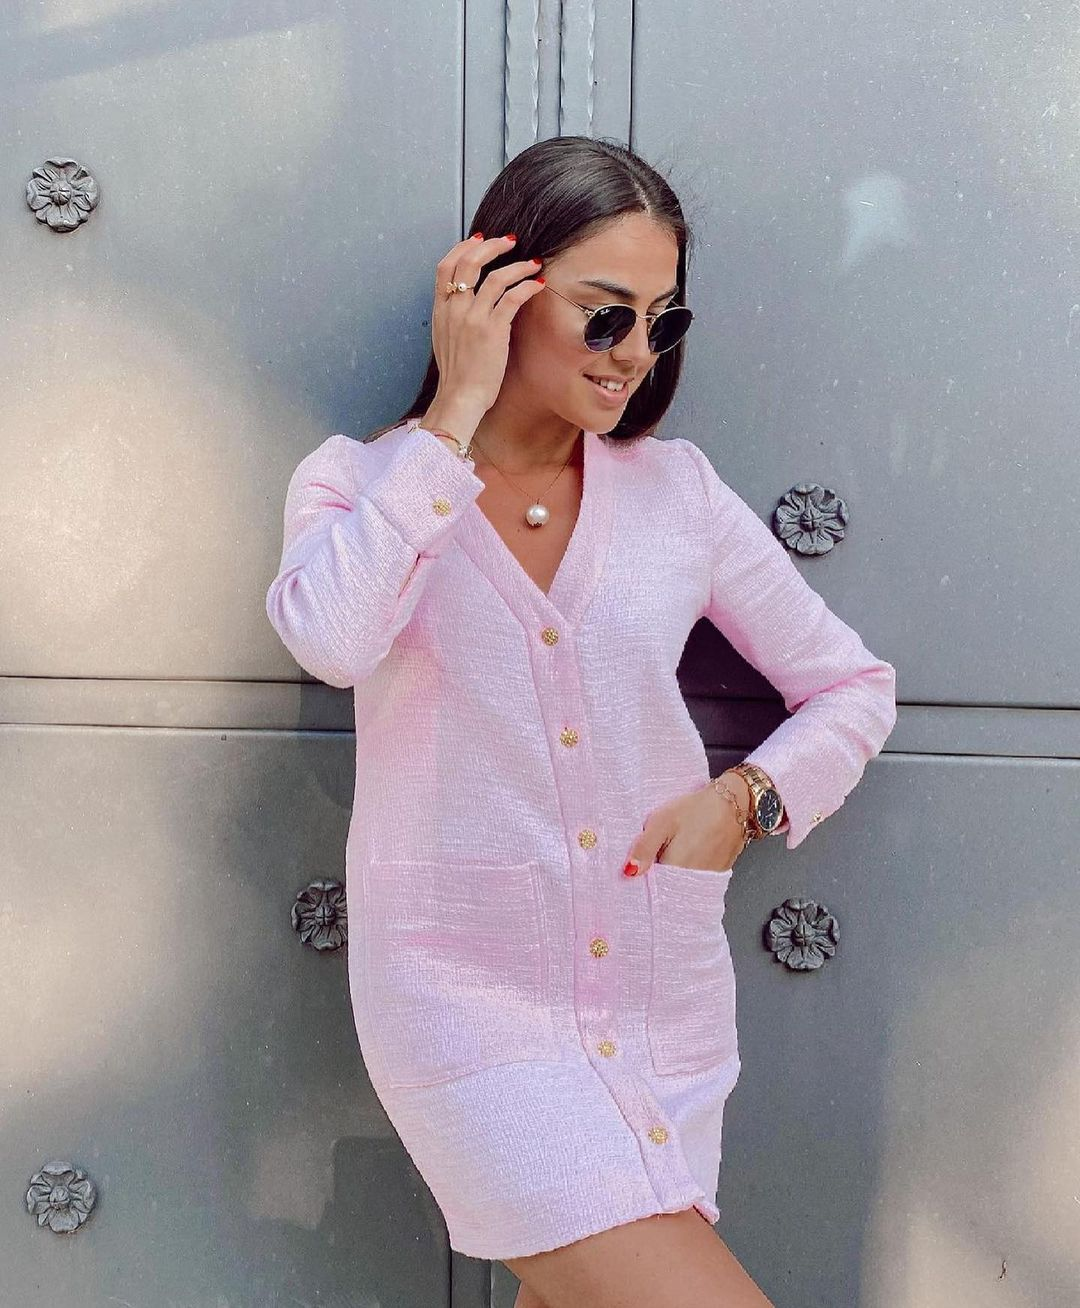 structured jacket with buttons de Zara sur zaradiccion__